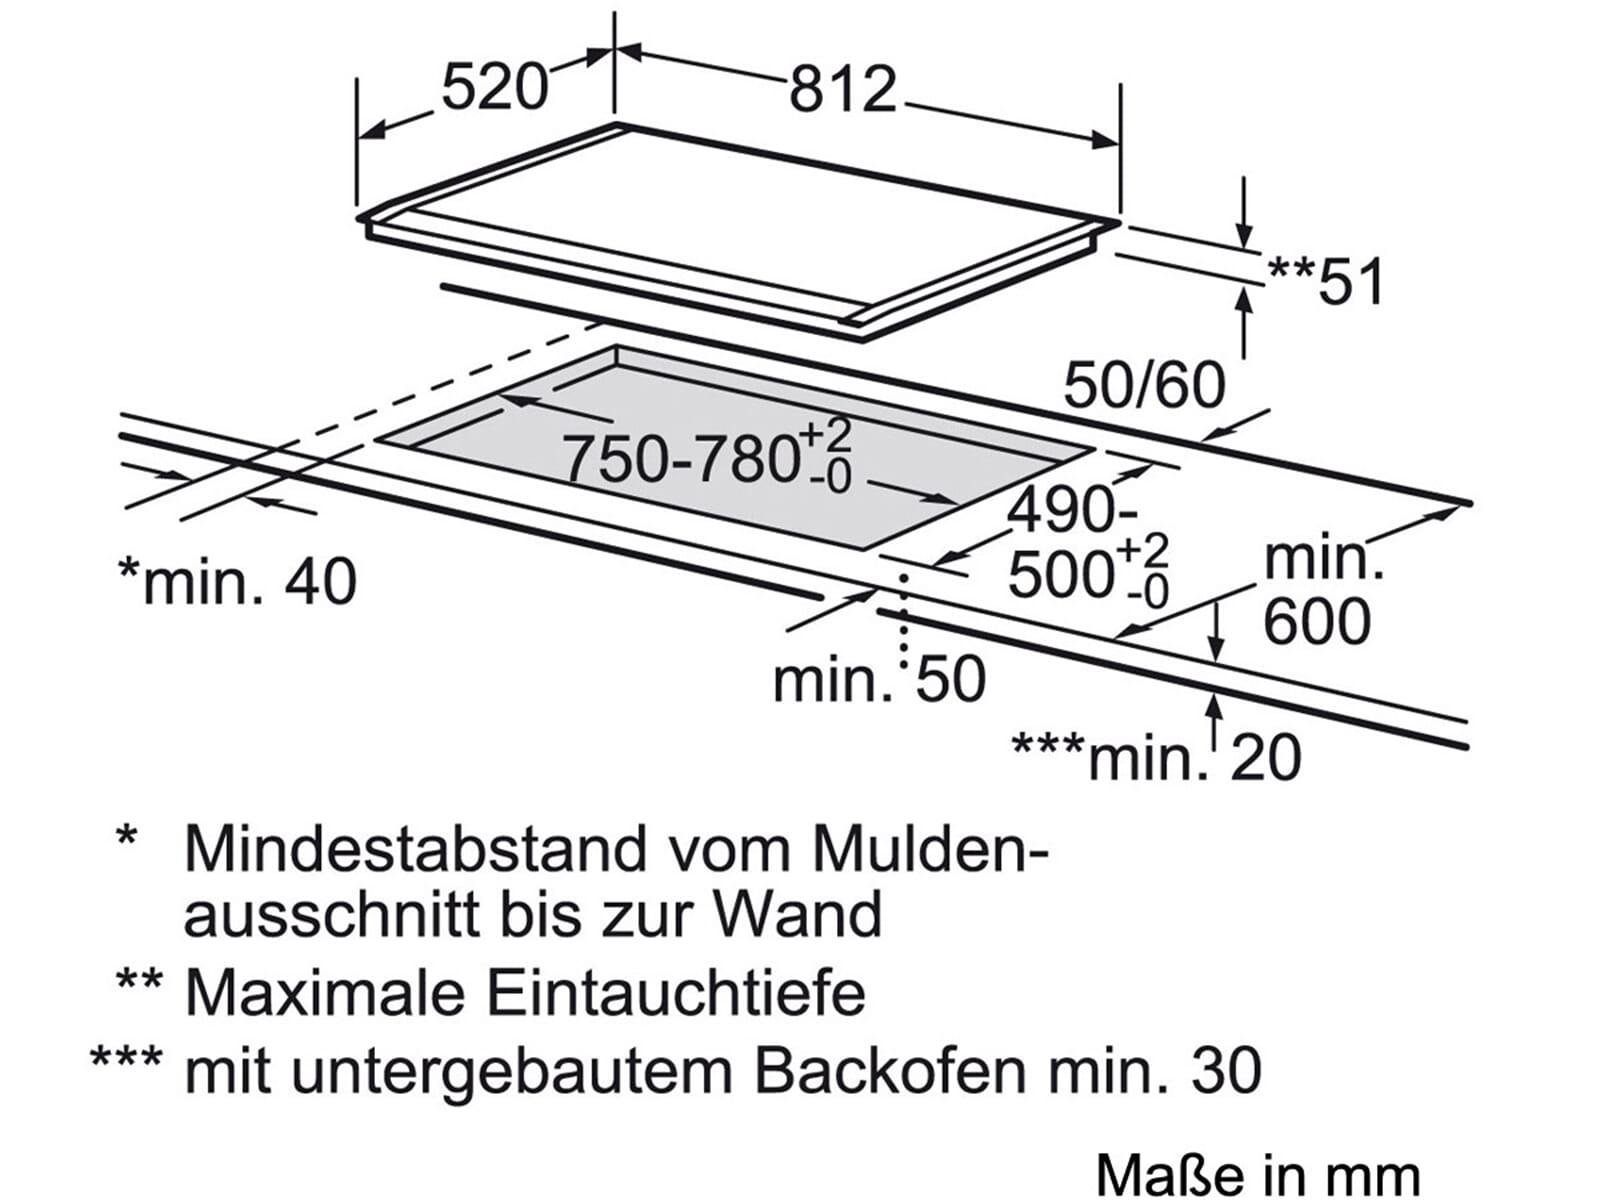 siemens eh875sc11e induktionskochfeld autark. Black Bedroom Furniture Sets. Home Design Ideas